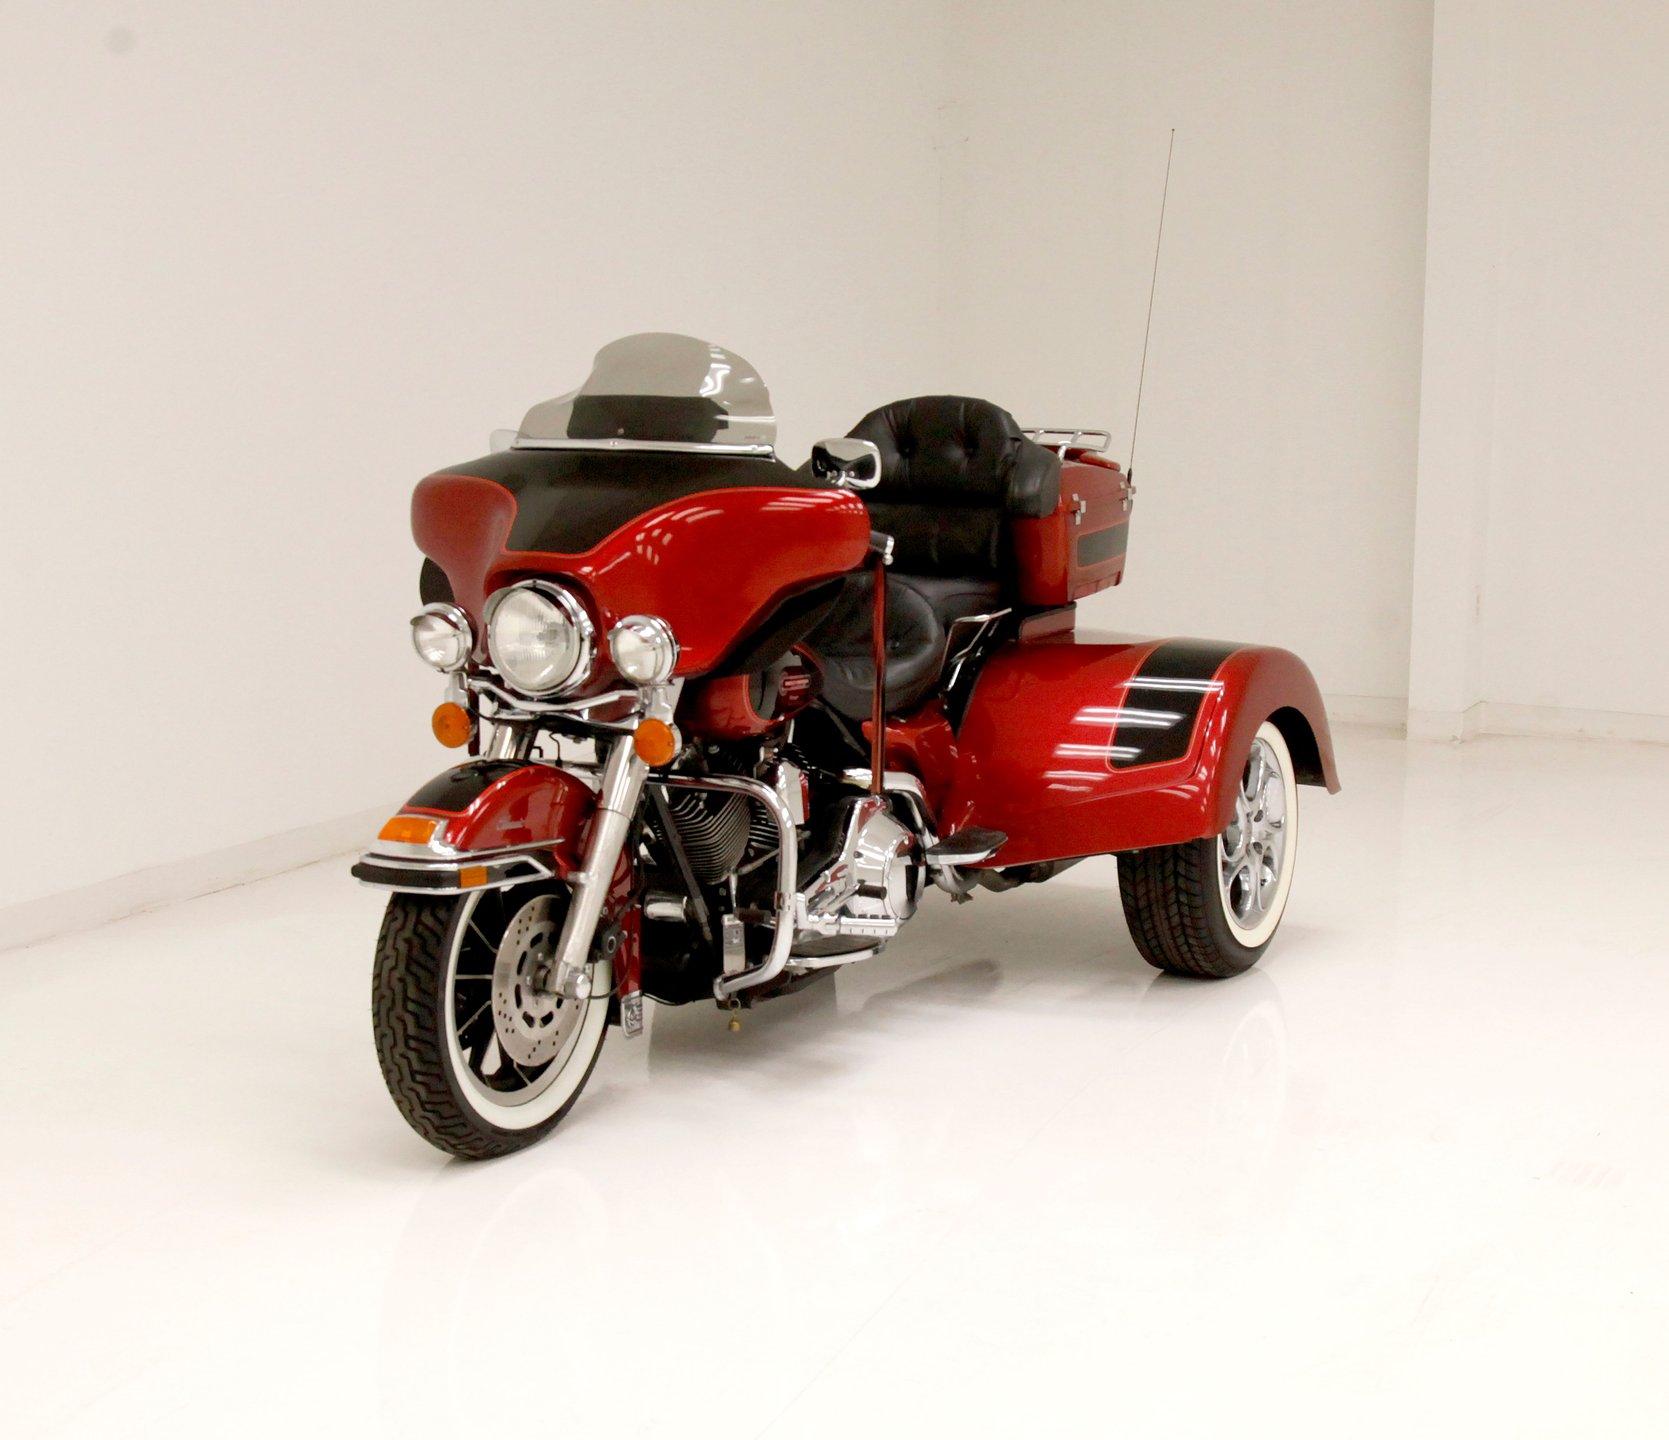 1999 Harley Davidson Electra Glide